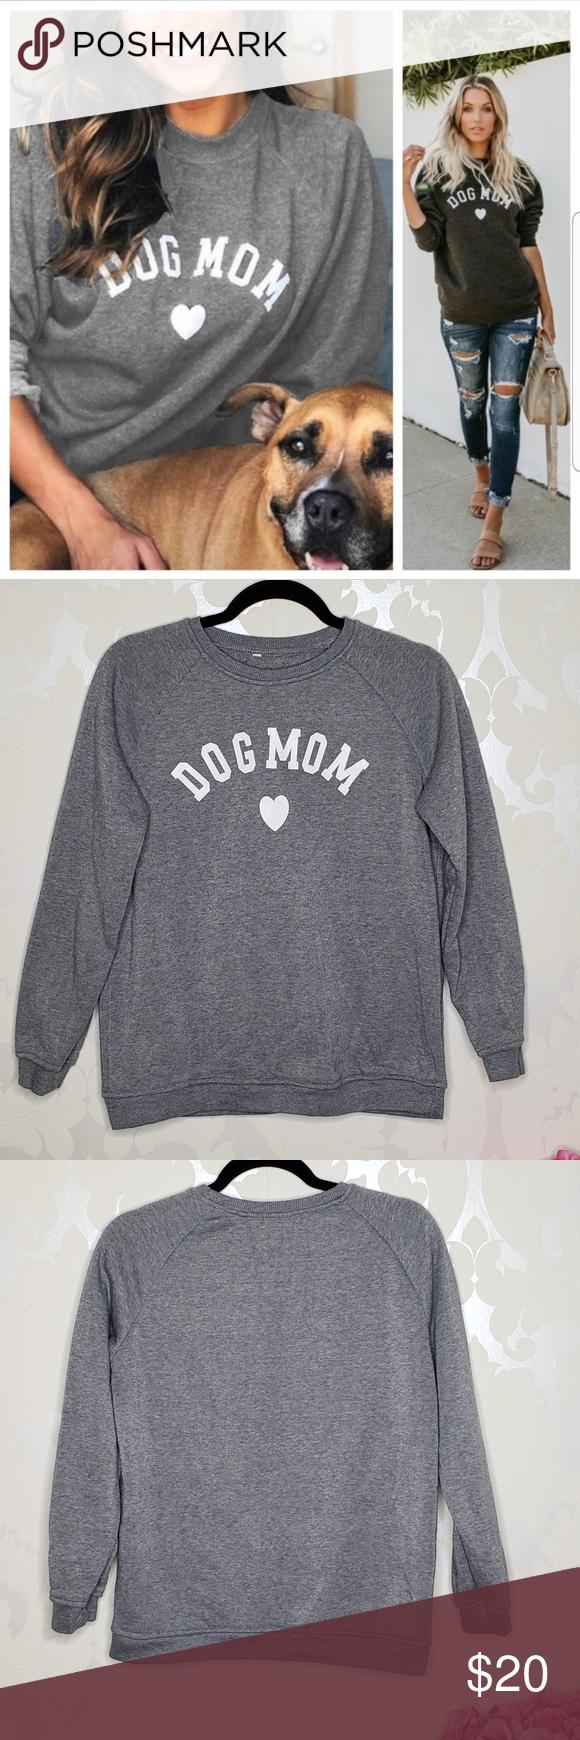 Dog Mom Dark Gray Crewneck Sweatshirt Sweater Szl Grey Crewneck Sweatshirt Sweater Crew Neck Sweatshirt [ 1740 x 580 Pixel ]